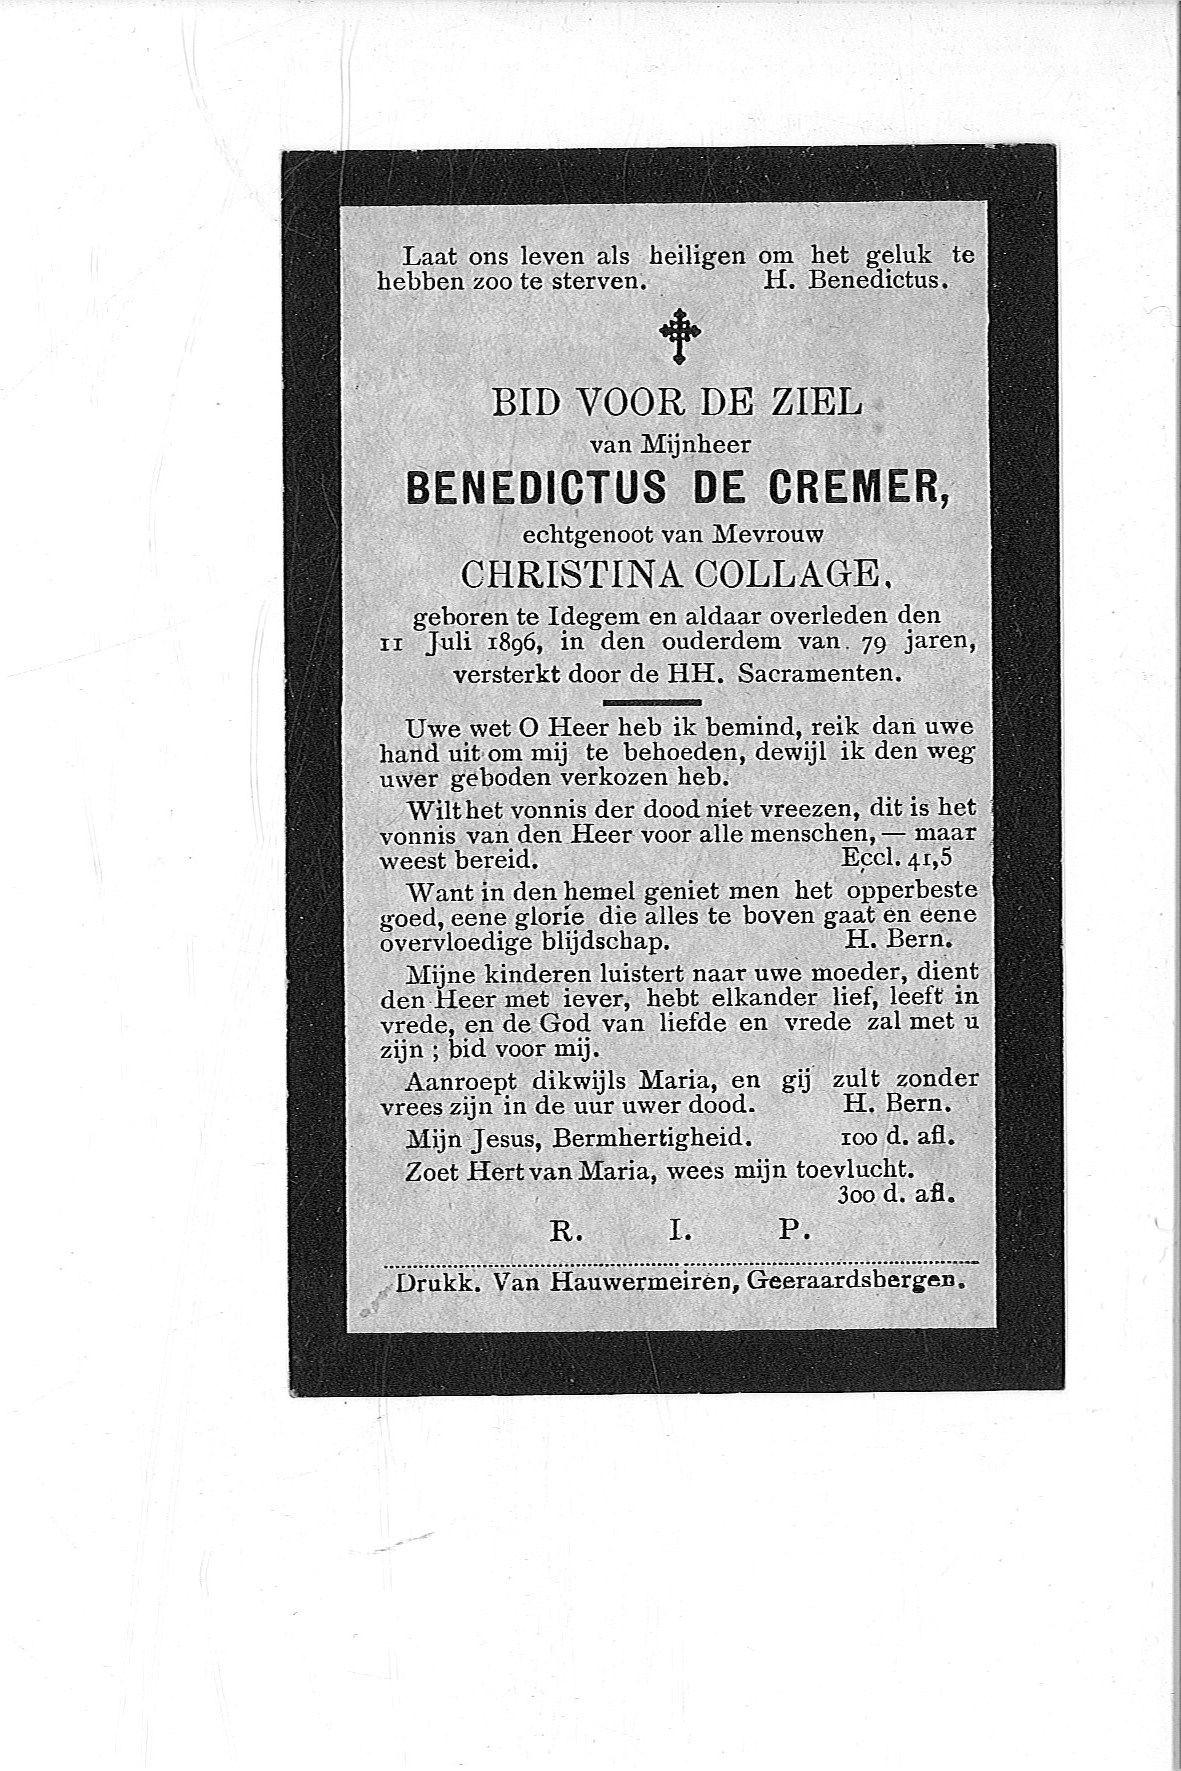 Benedictus20090824172909_00003.jpg